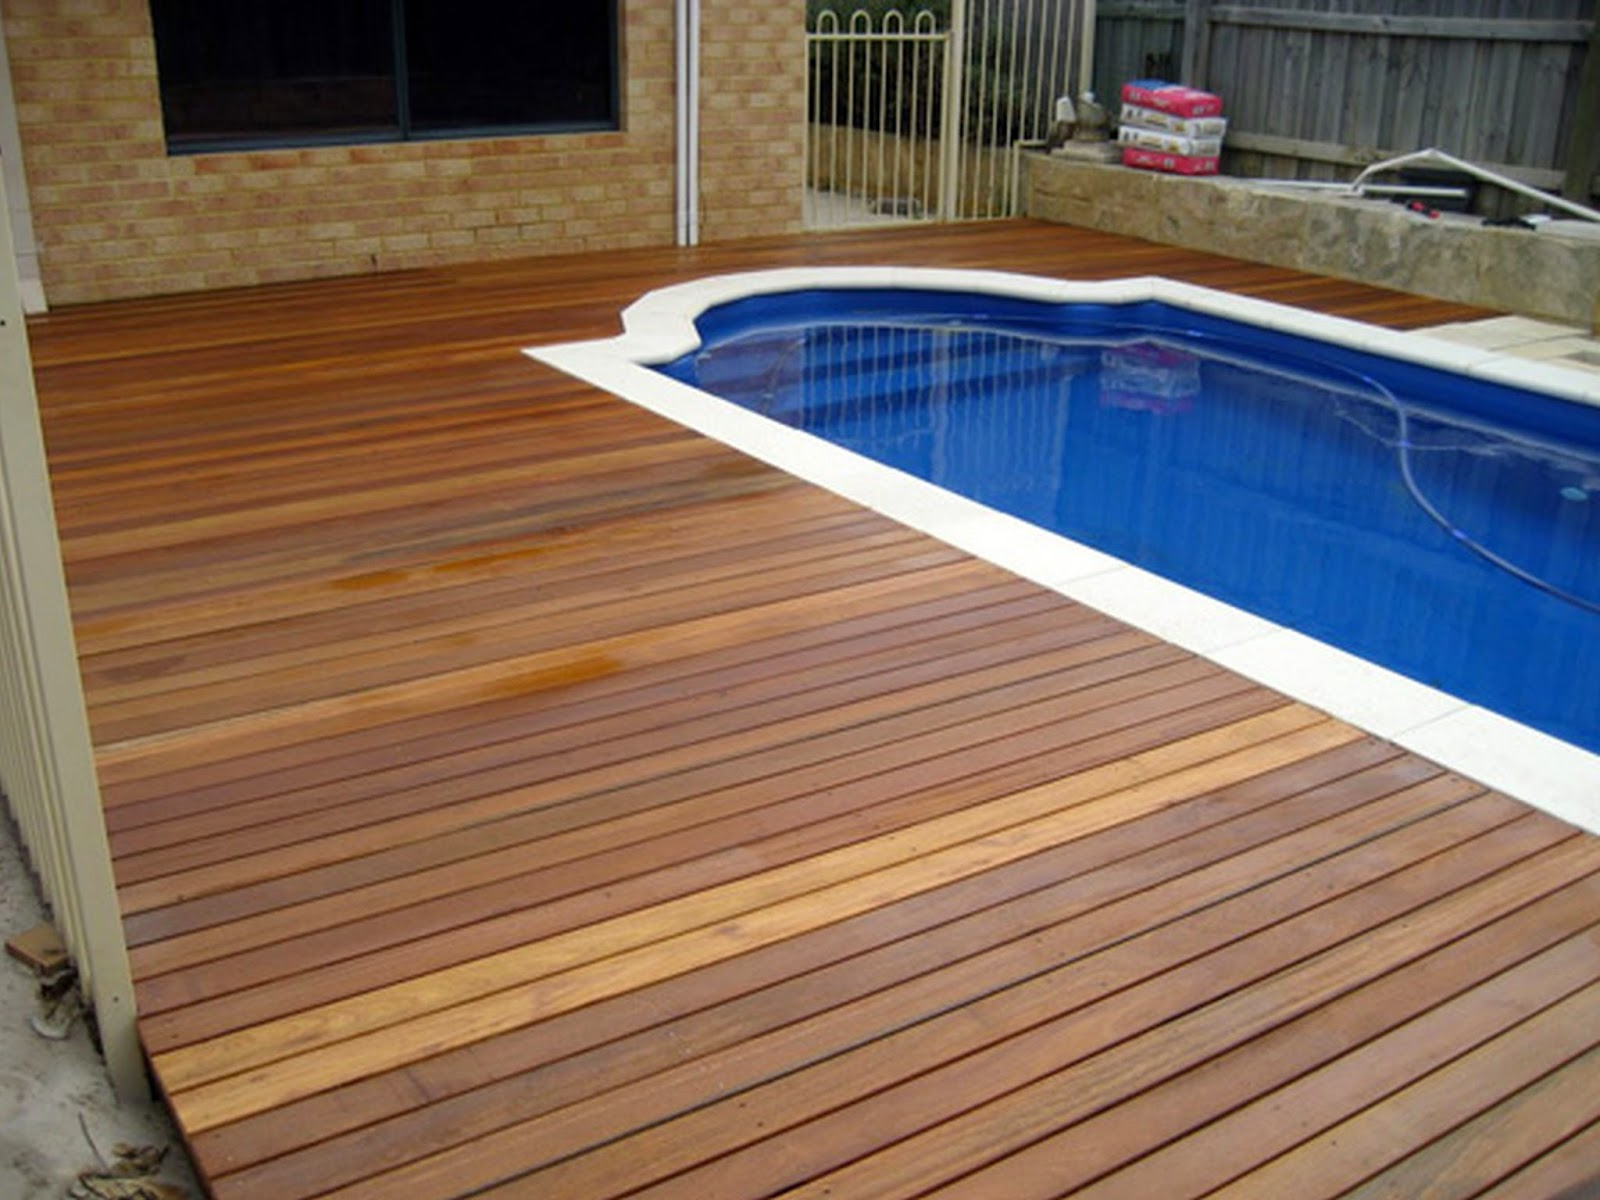 Wood Pool Deck Ideas Amazing Modern Pool Deck Design For Swimming Pool  Design Ideas